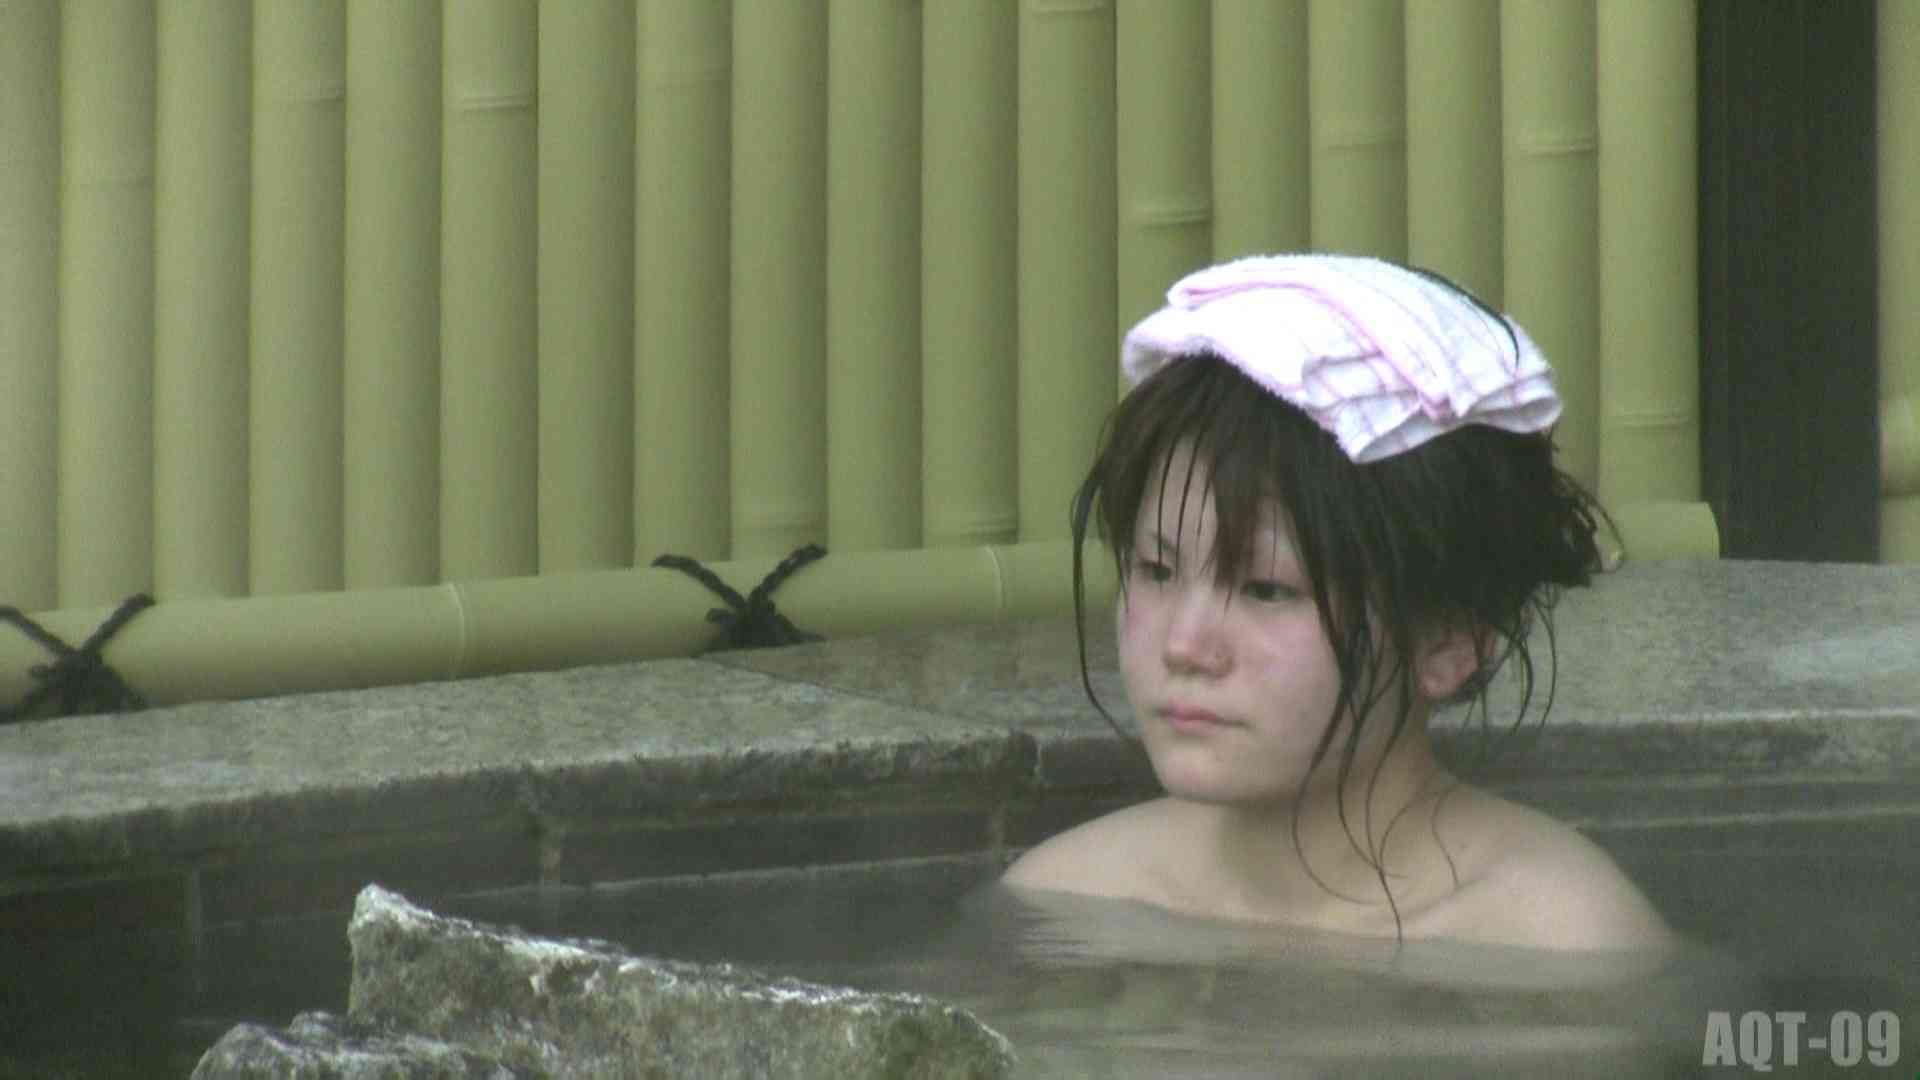 Aquaな露天風呂Vol.789 盗撮映像  51Pix 10